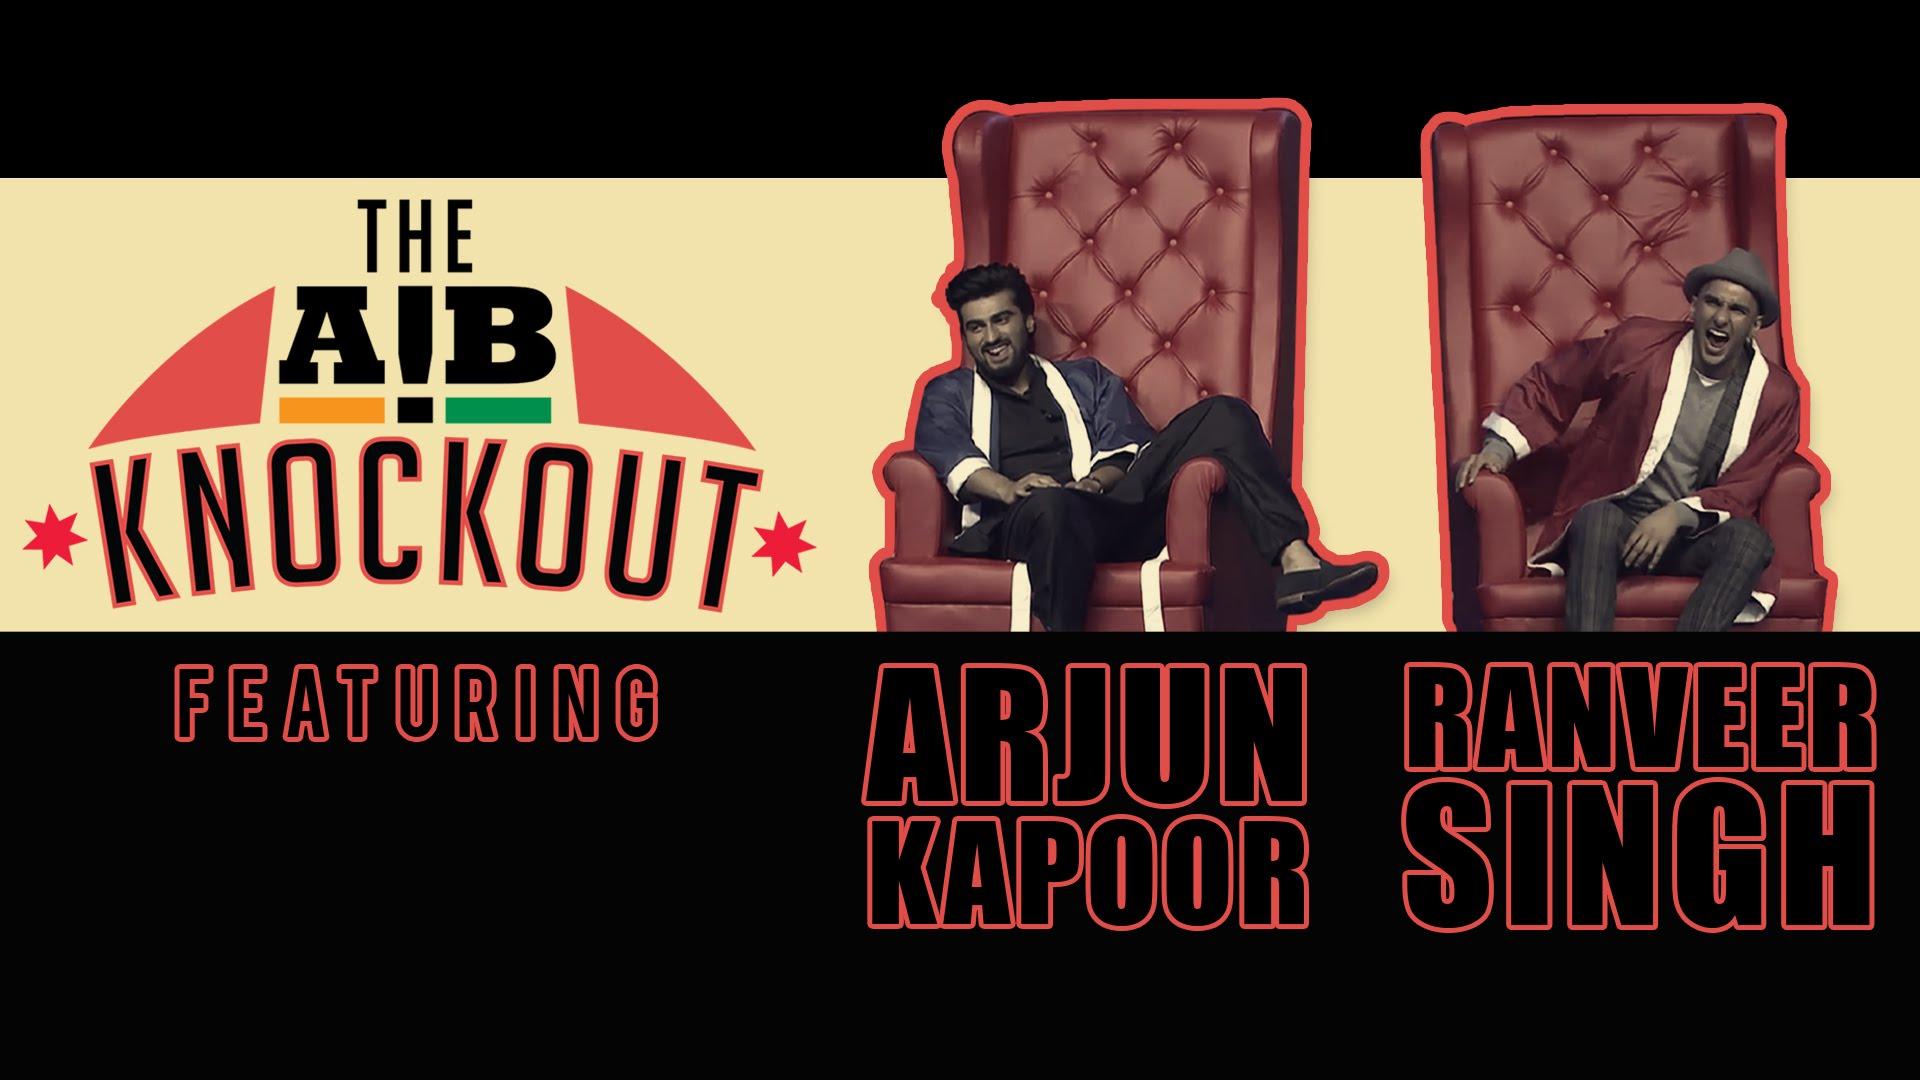 Trailer: AIB Knockout | Ranveer Singh, Arjun Kapoor, Karan Johar |